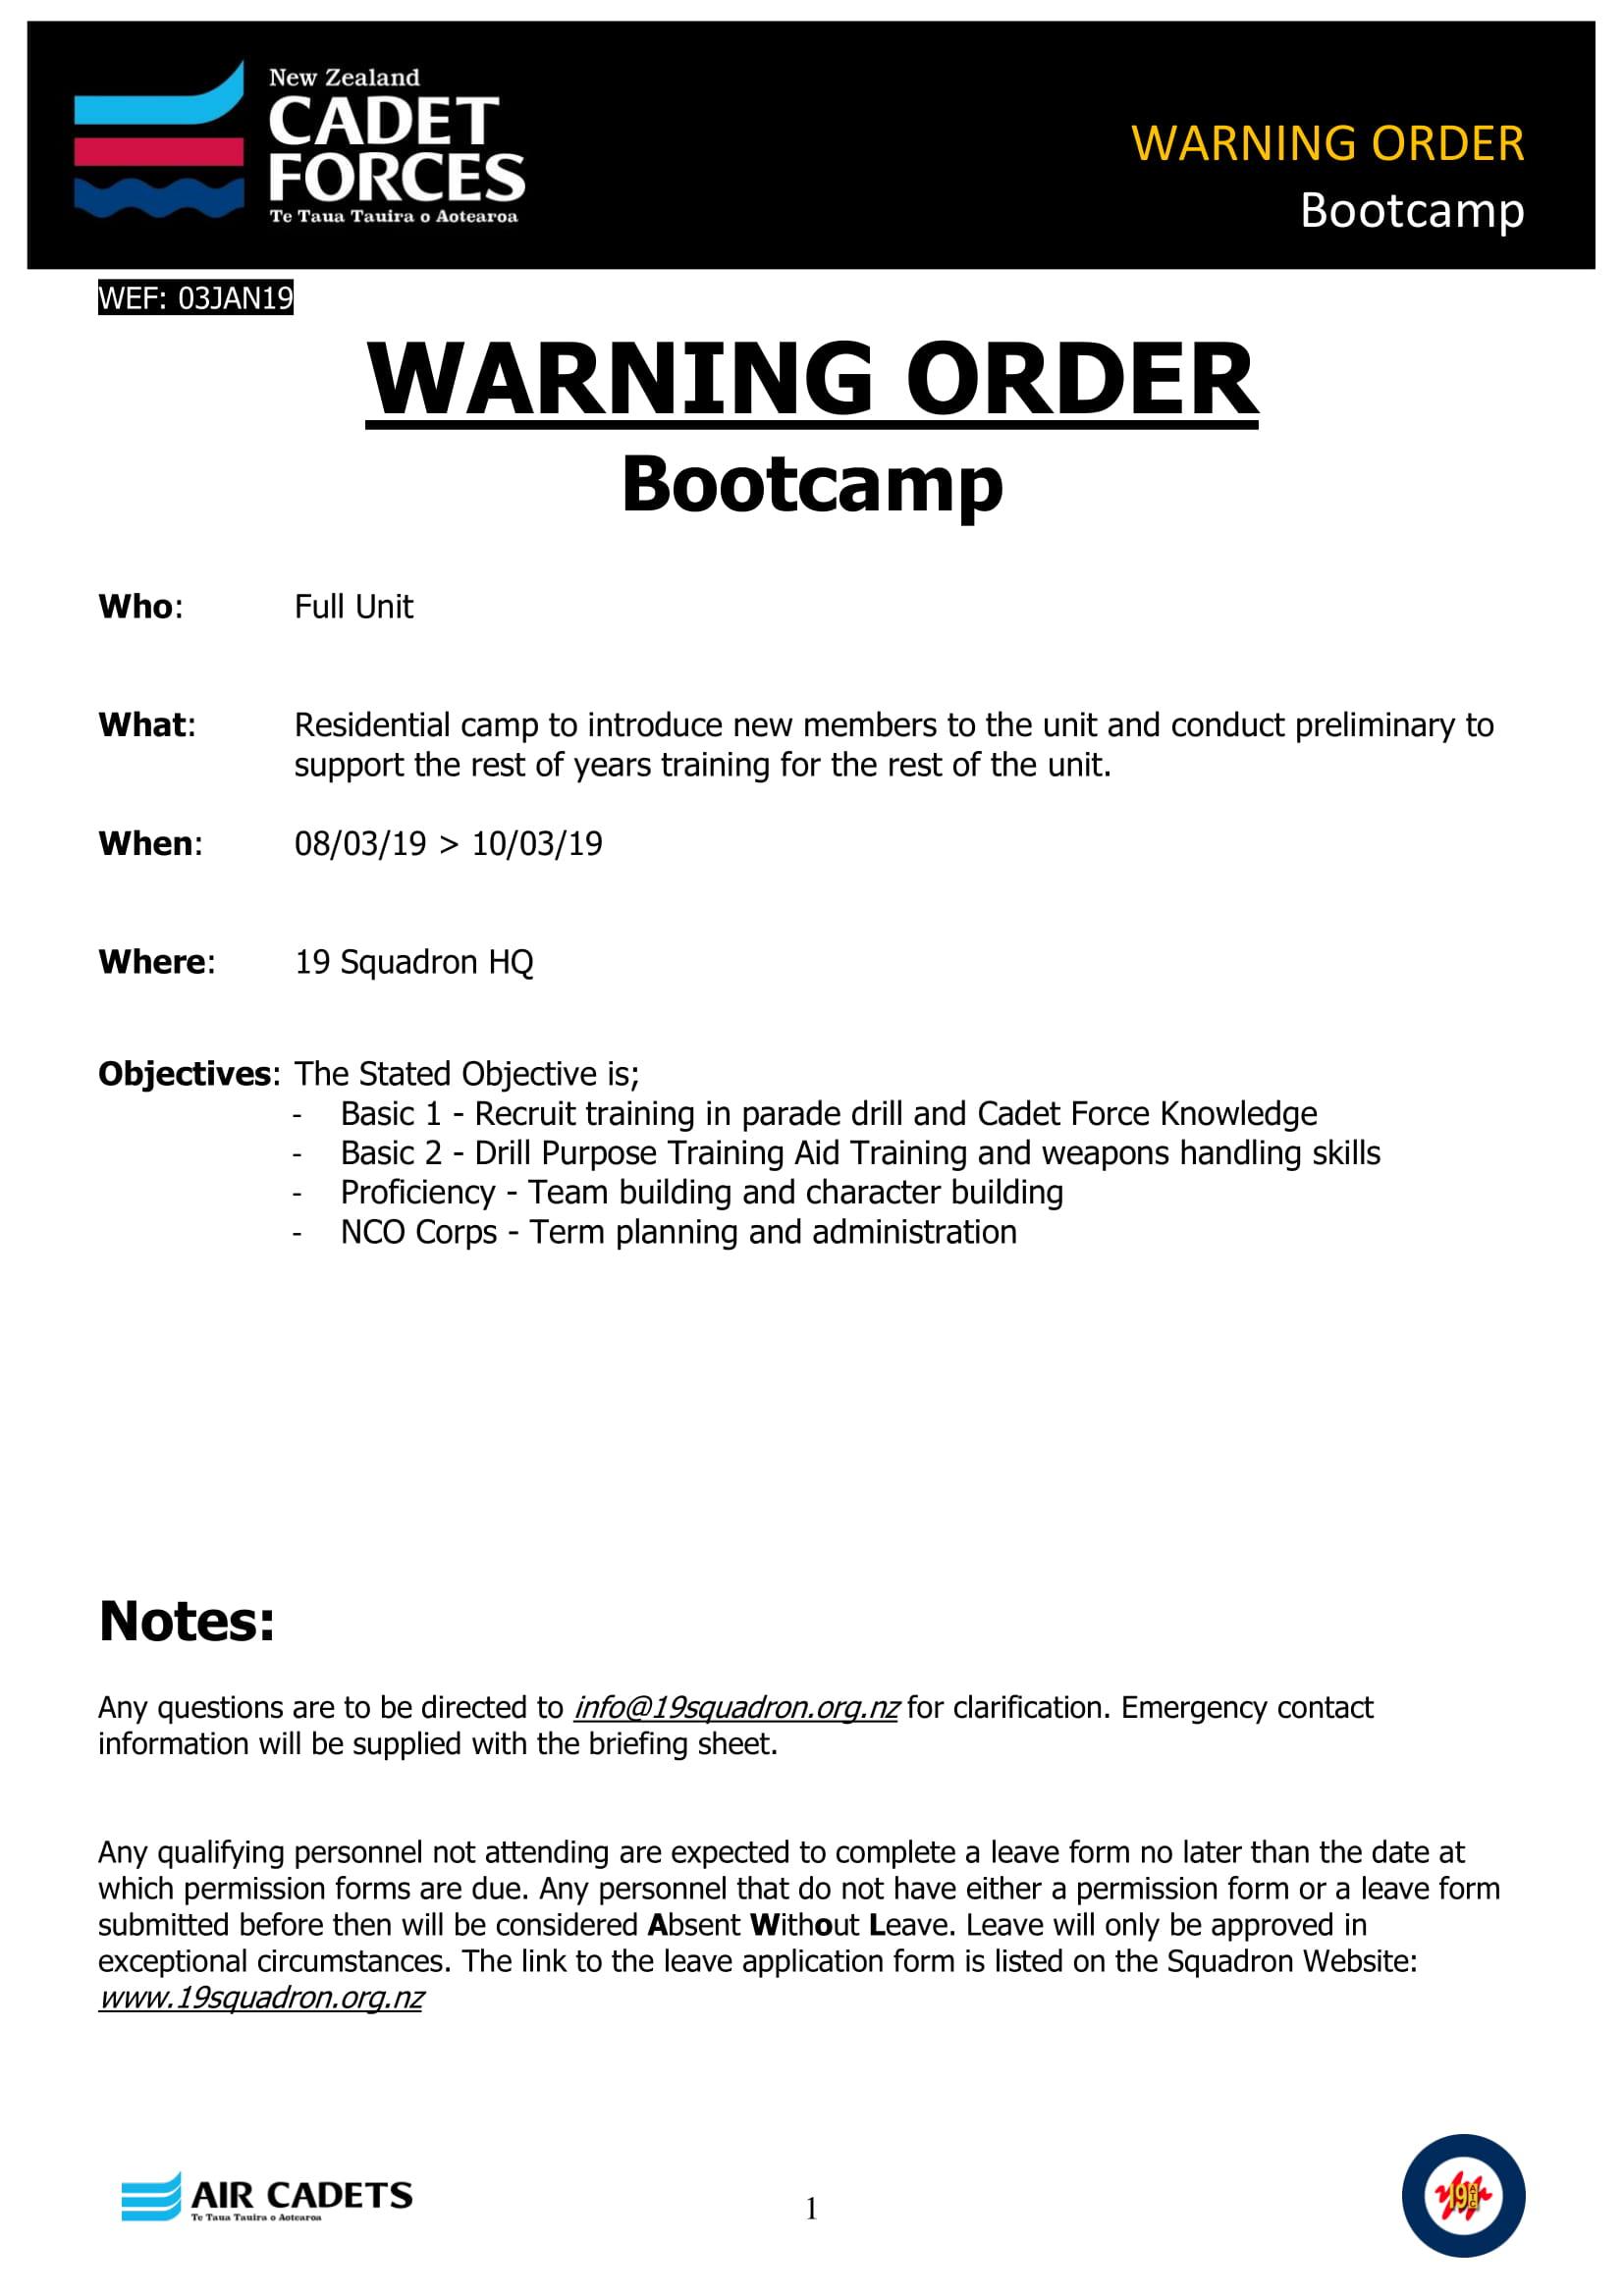 Bootcamp - Warning Order-1.jpg